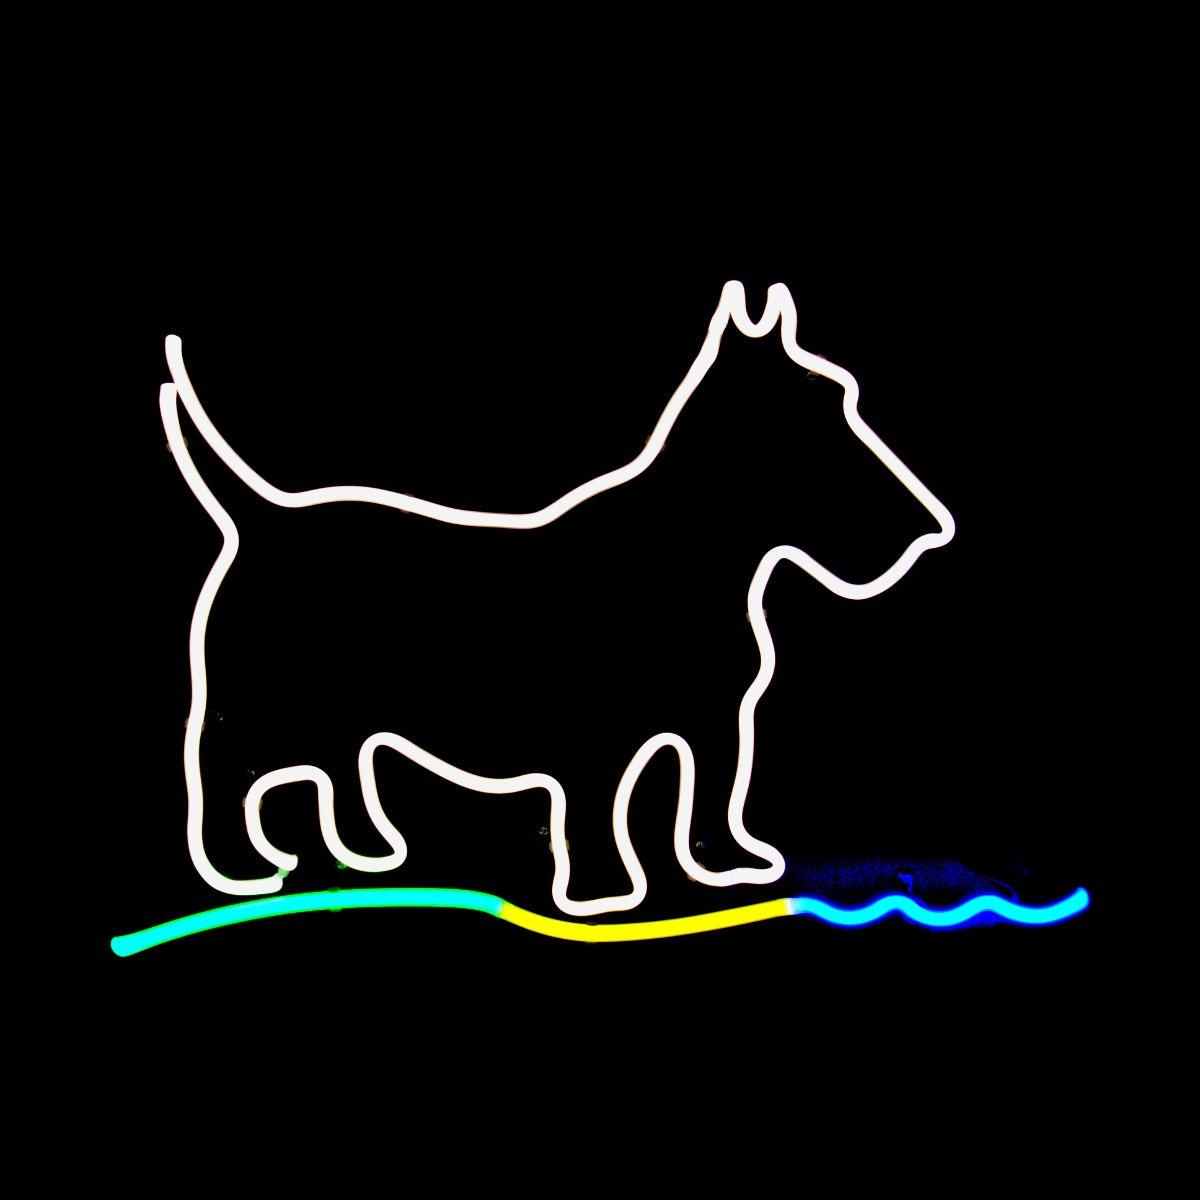 Gallery Display Clearance - Scottie Dog Neon Light Sculpture - John Barton - BartonNeonMagic.com